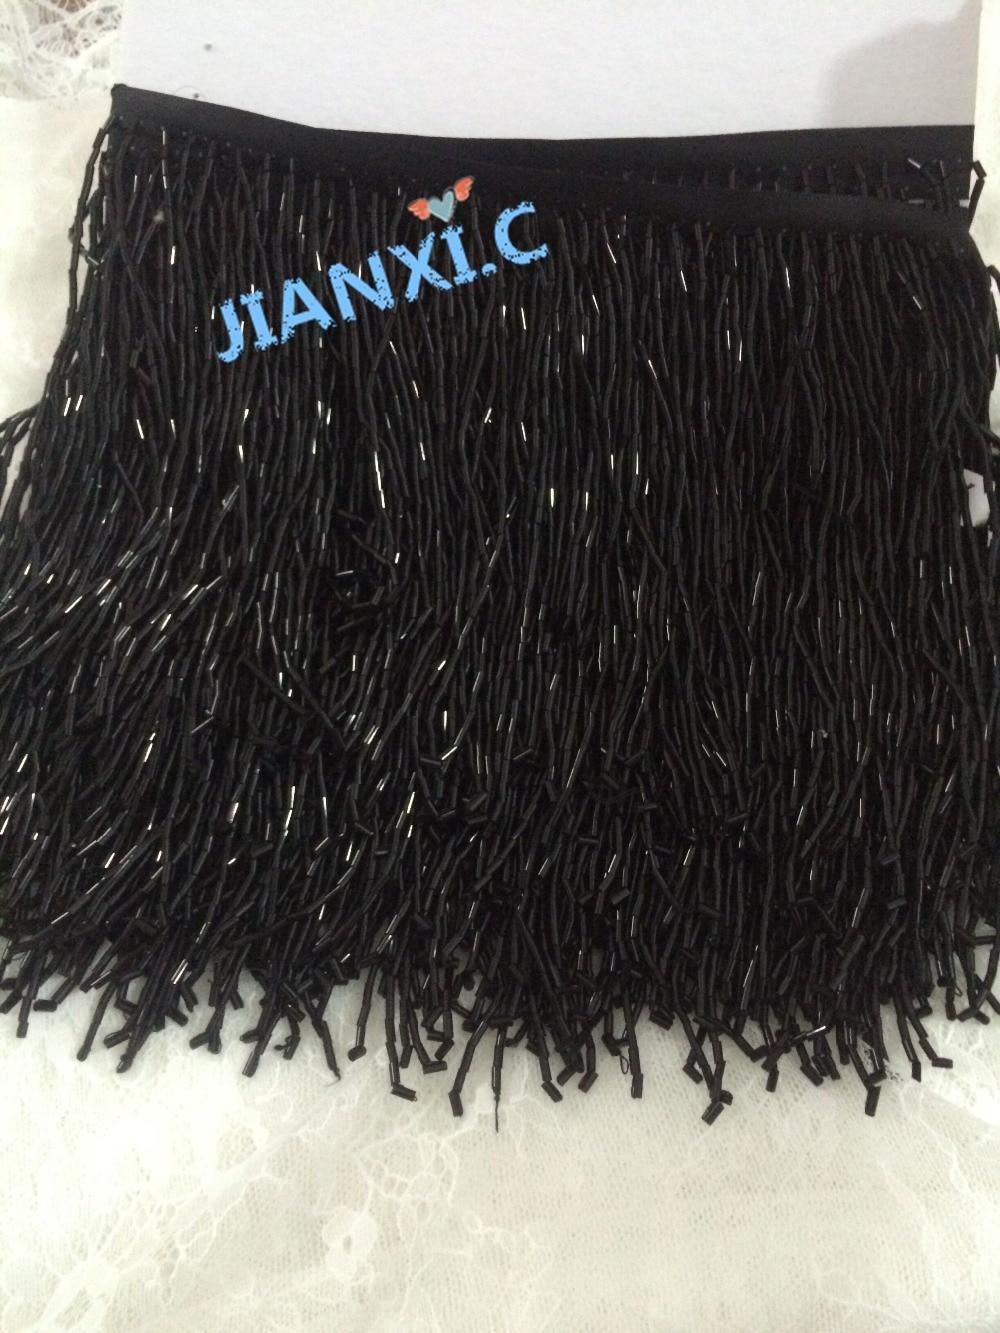 JIANXI C 72715 beaded Fringe Ribbon Trim Fringe Tassel Lace Trim 15cm length in black for